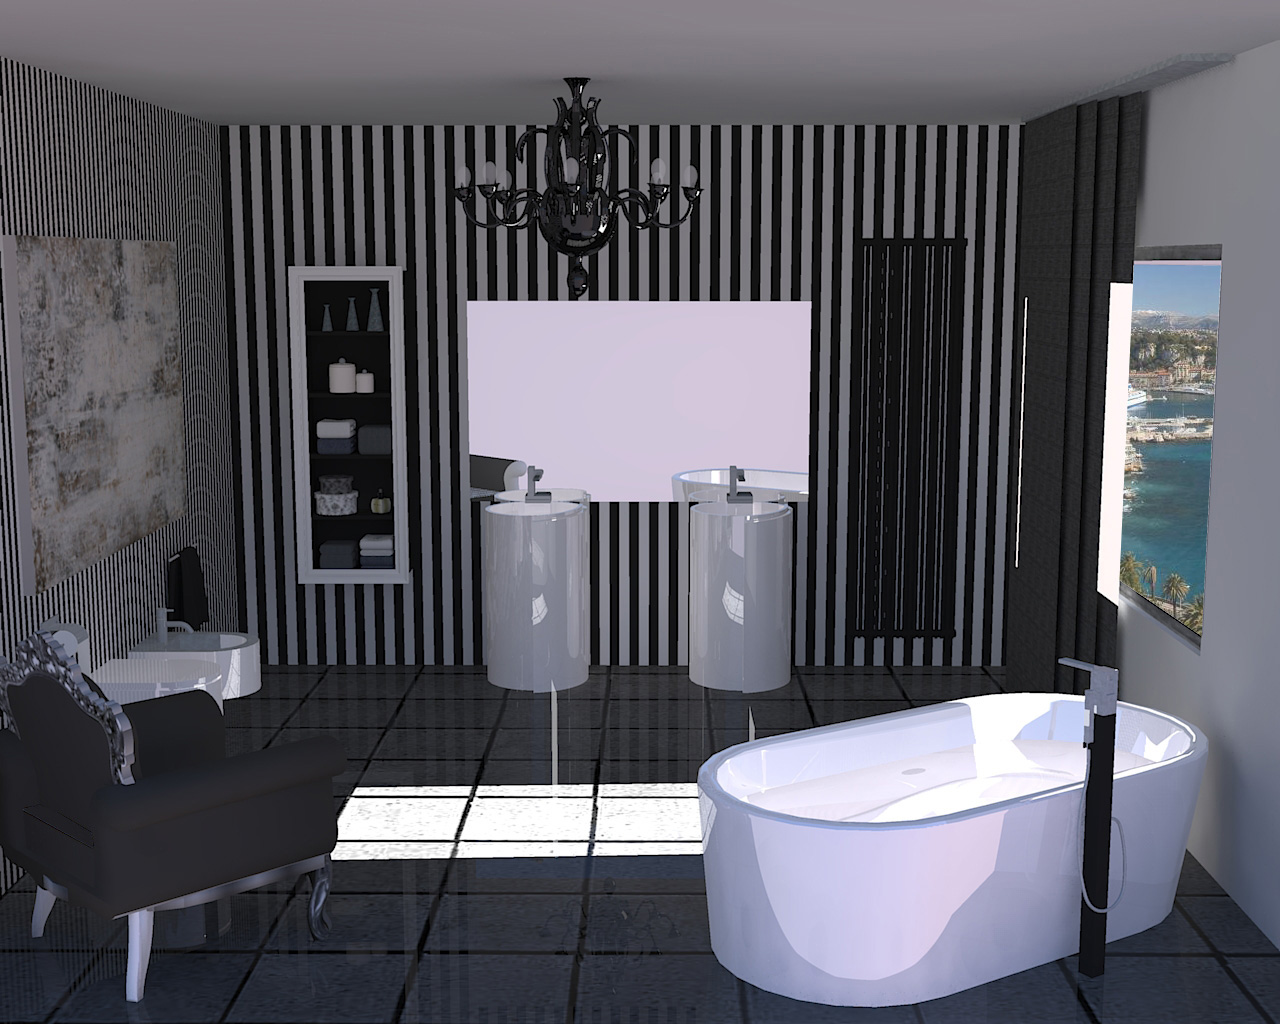 Bagno moderno - Bagno moderno foto ...